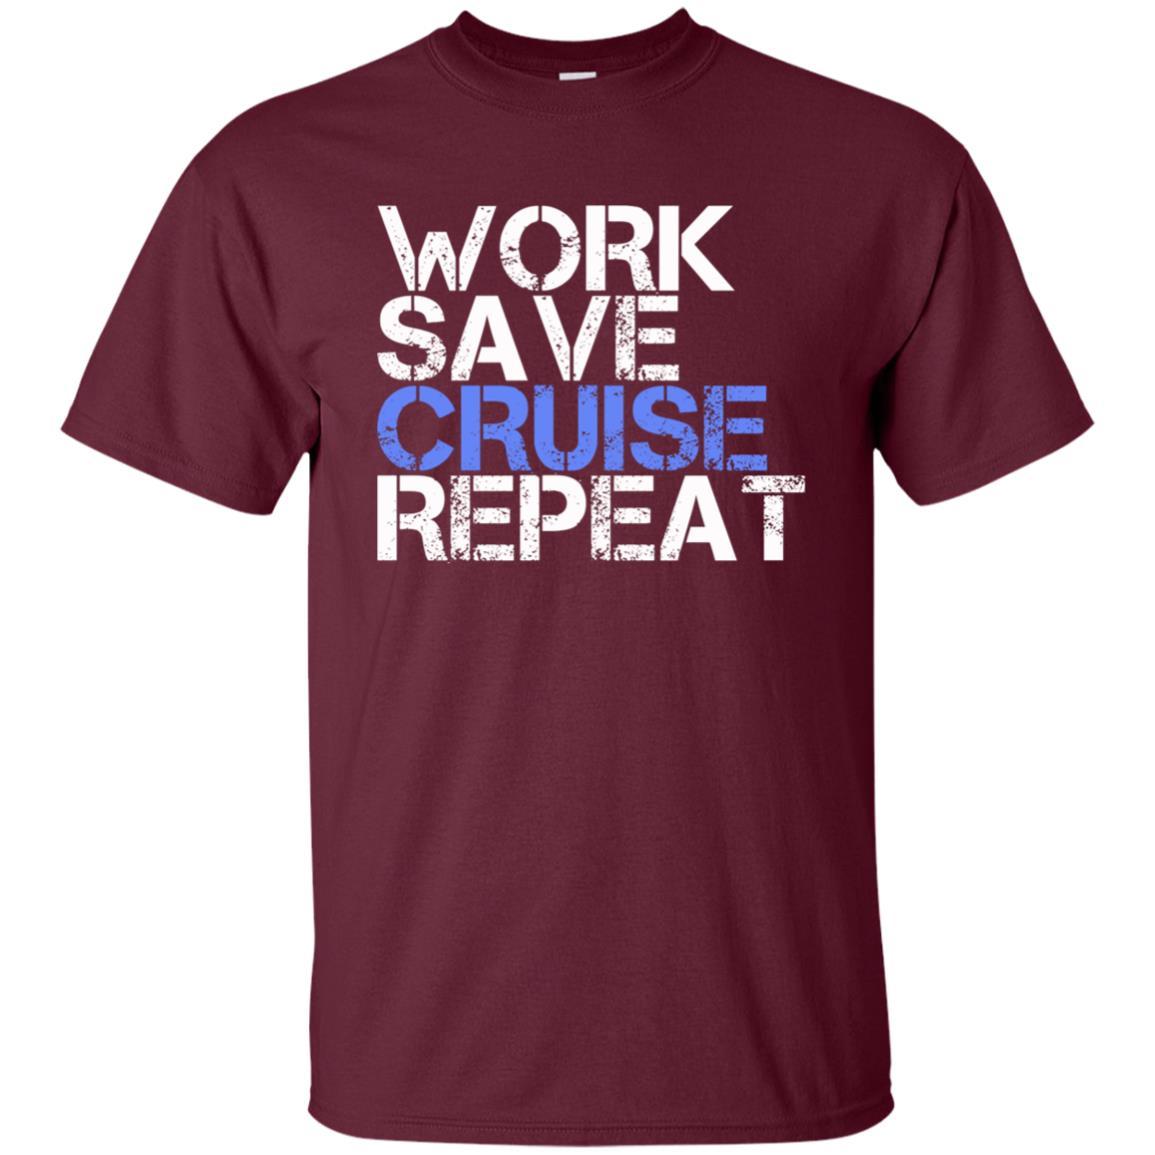 Funny Cruise Sayings Work Save Cruise Repeat Unisex Short Sleeve